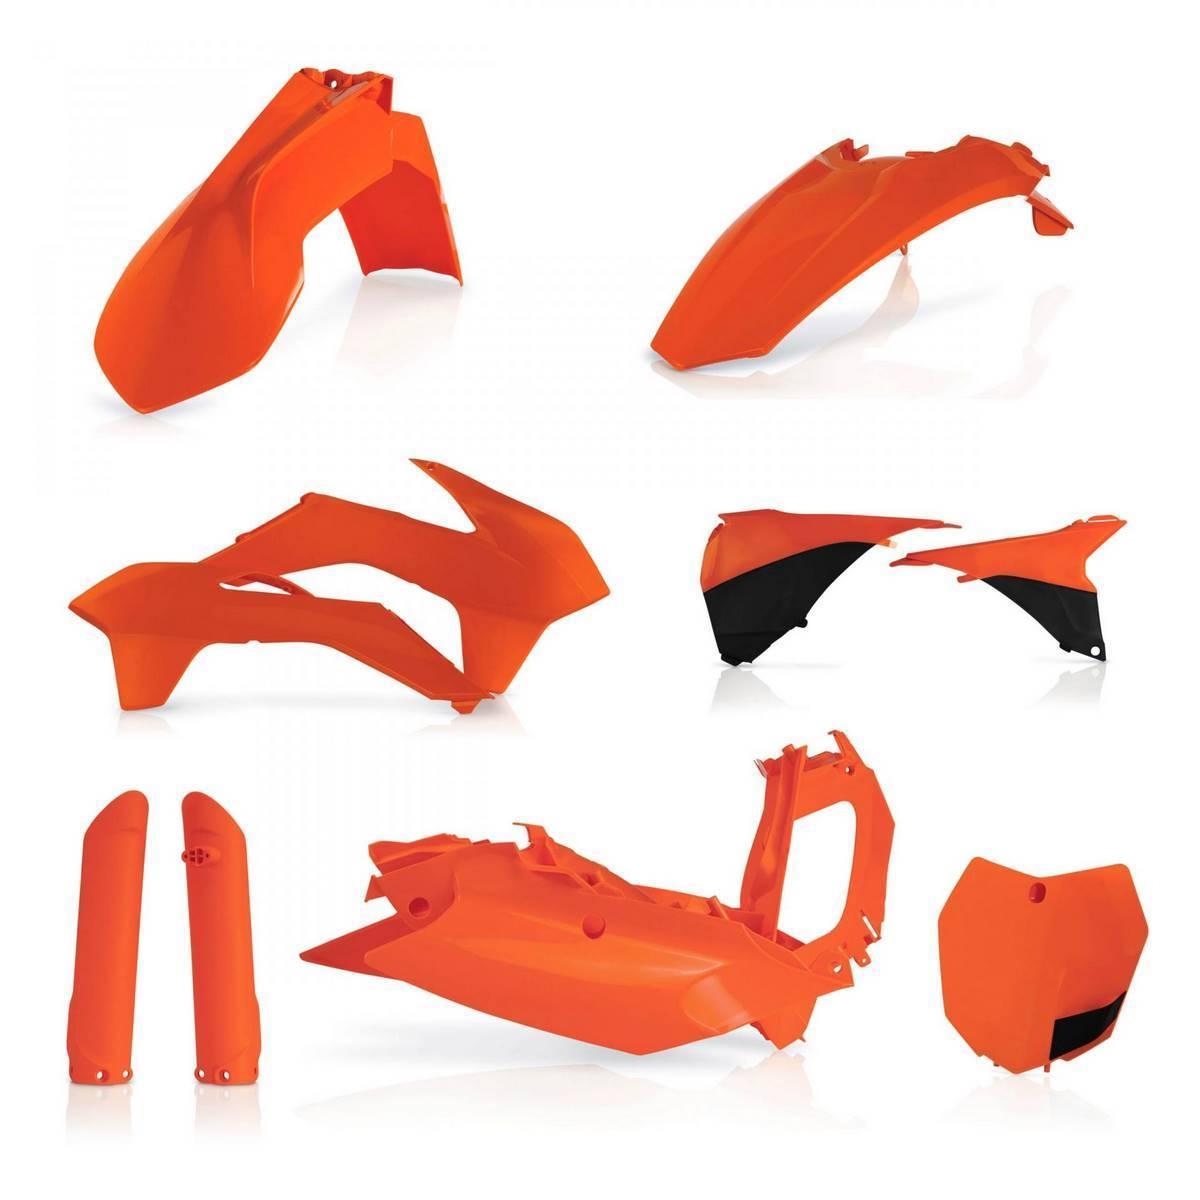 0017843-010 - Full Kit Plasticos Sxf 15 Negro